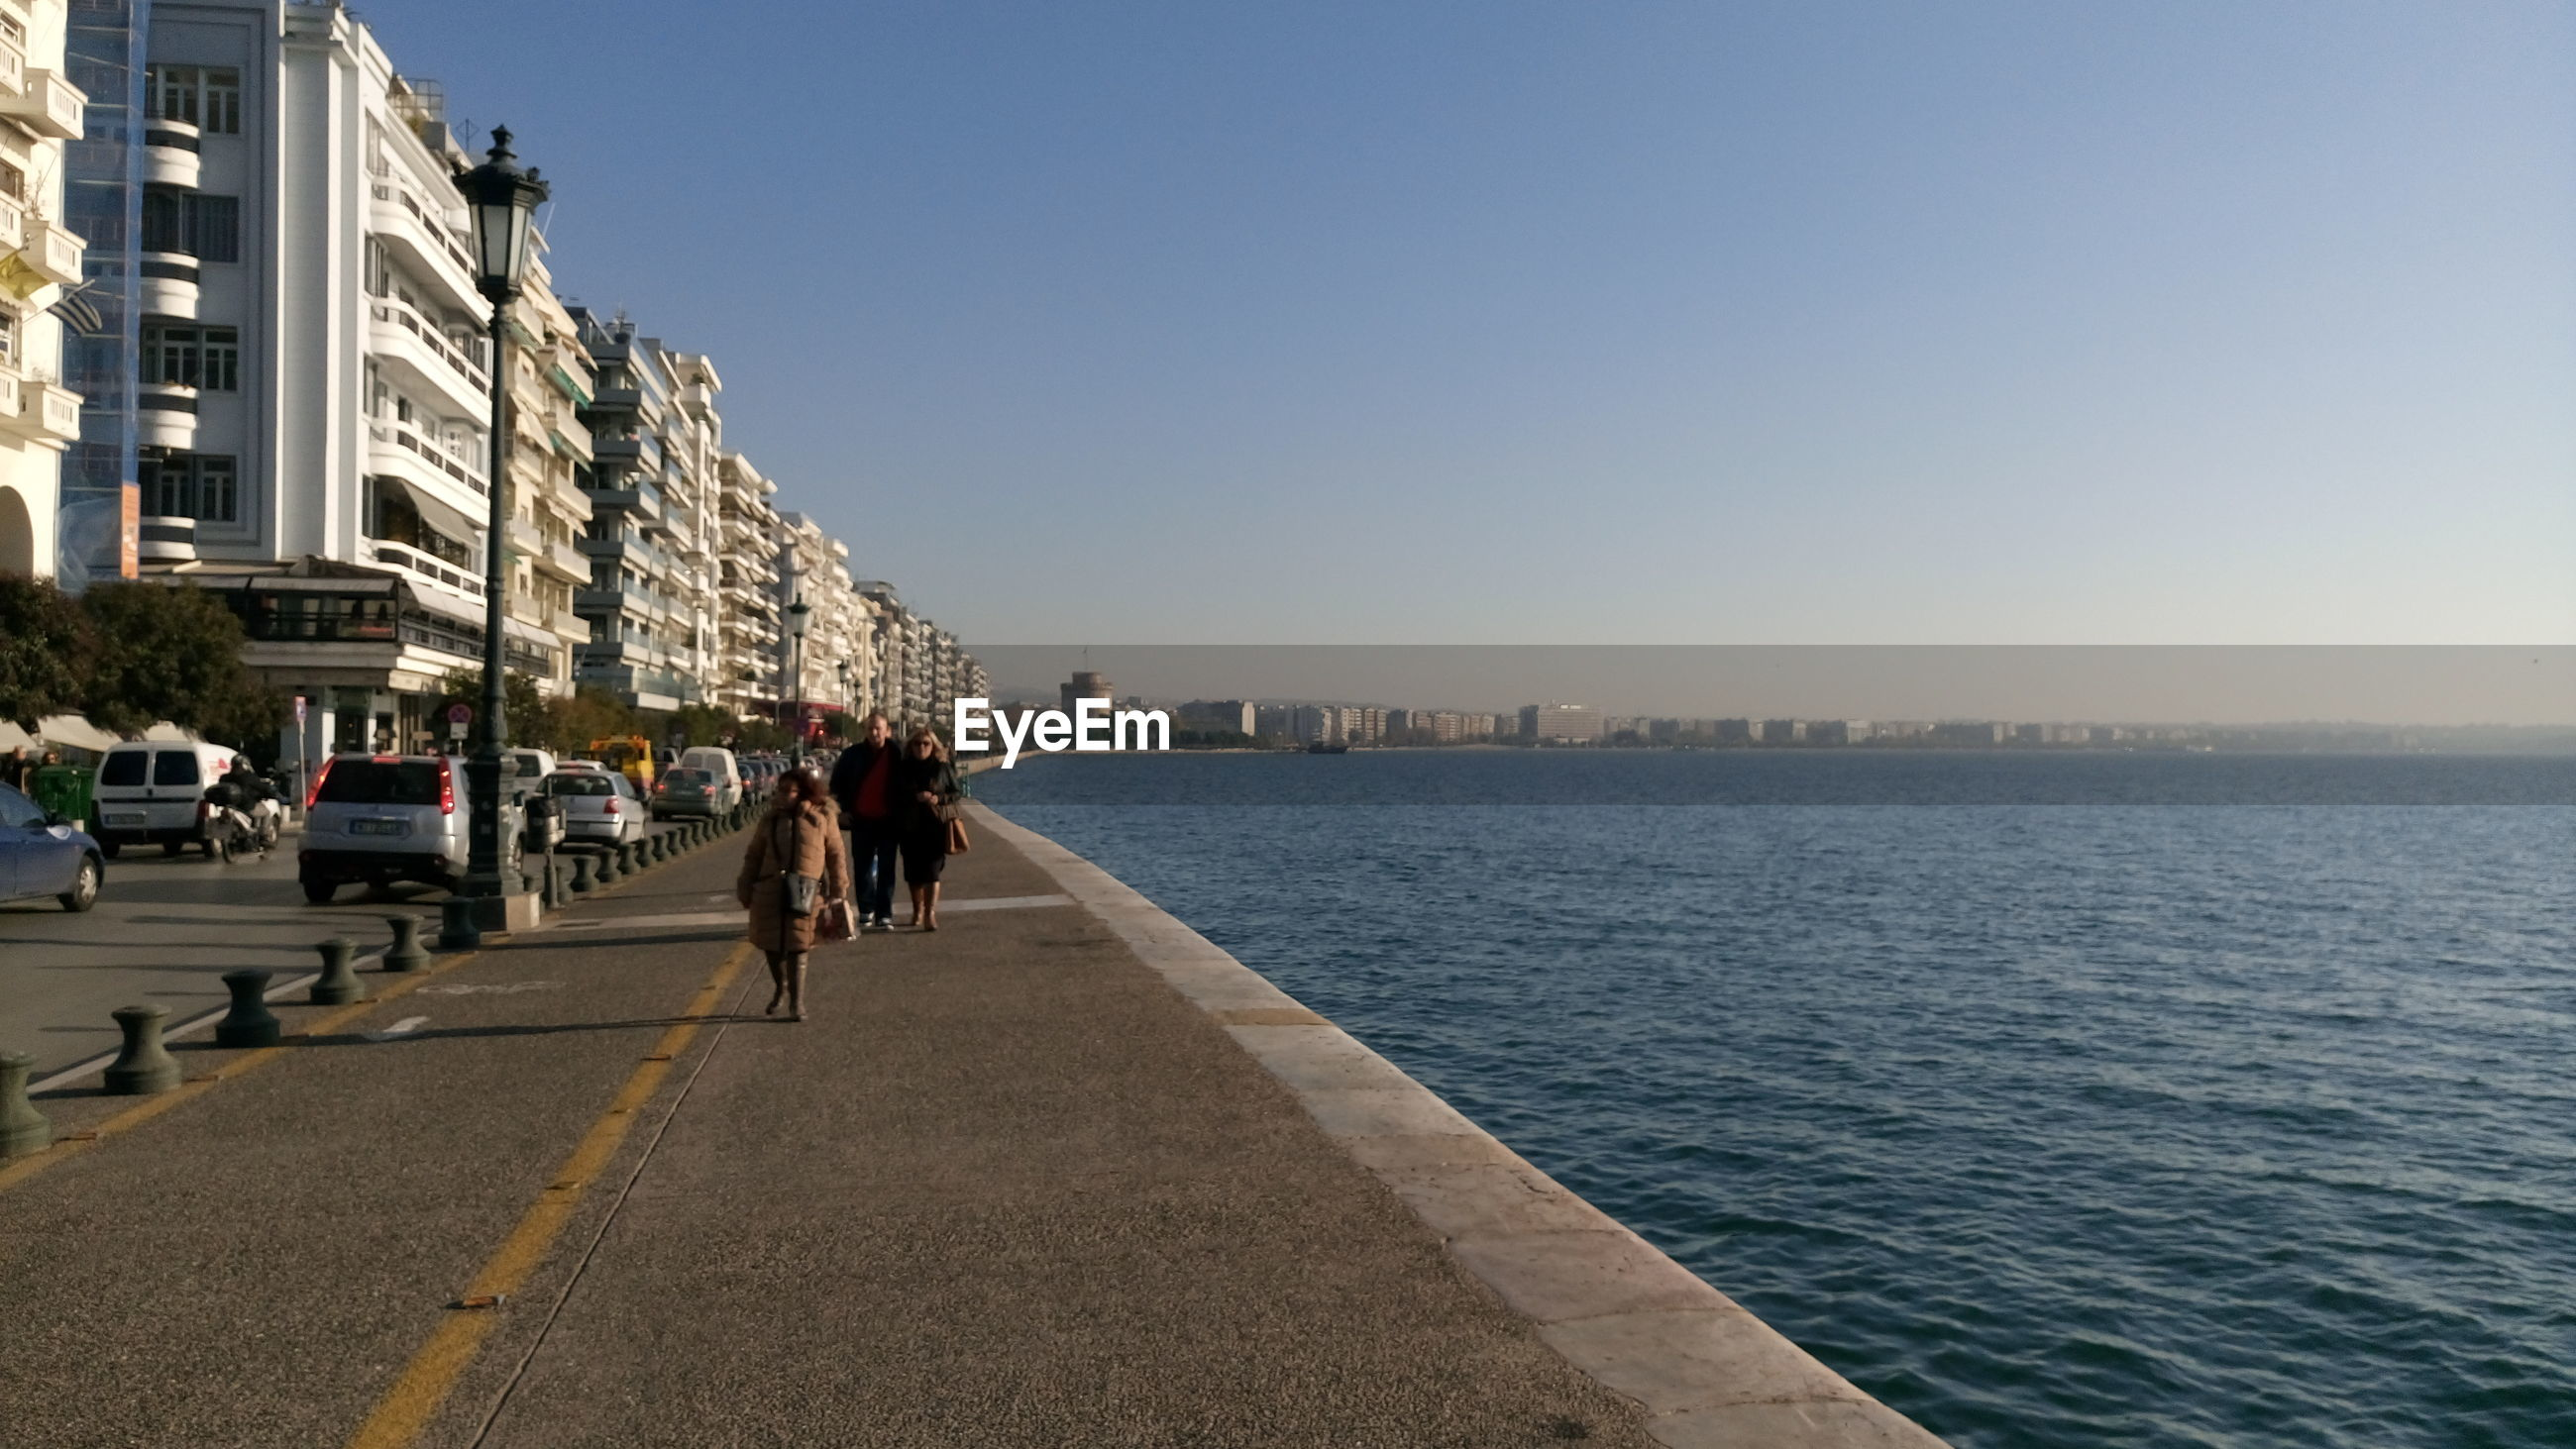 WOMEN WALKING ON WATER BY BUILDINGS AGAINST CLEAR SKY